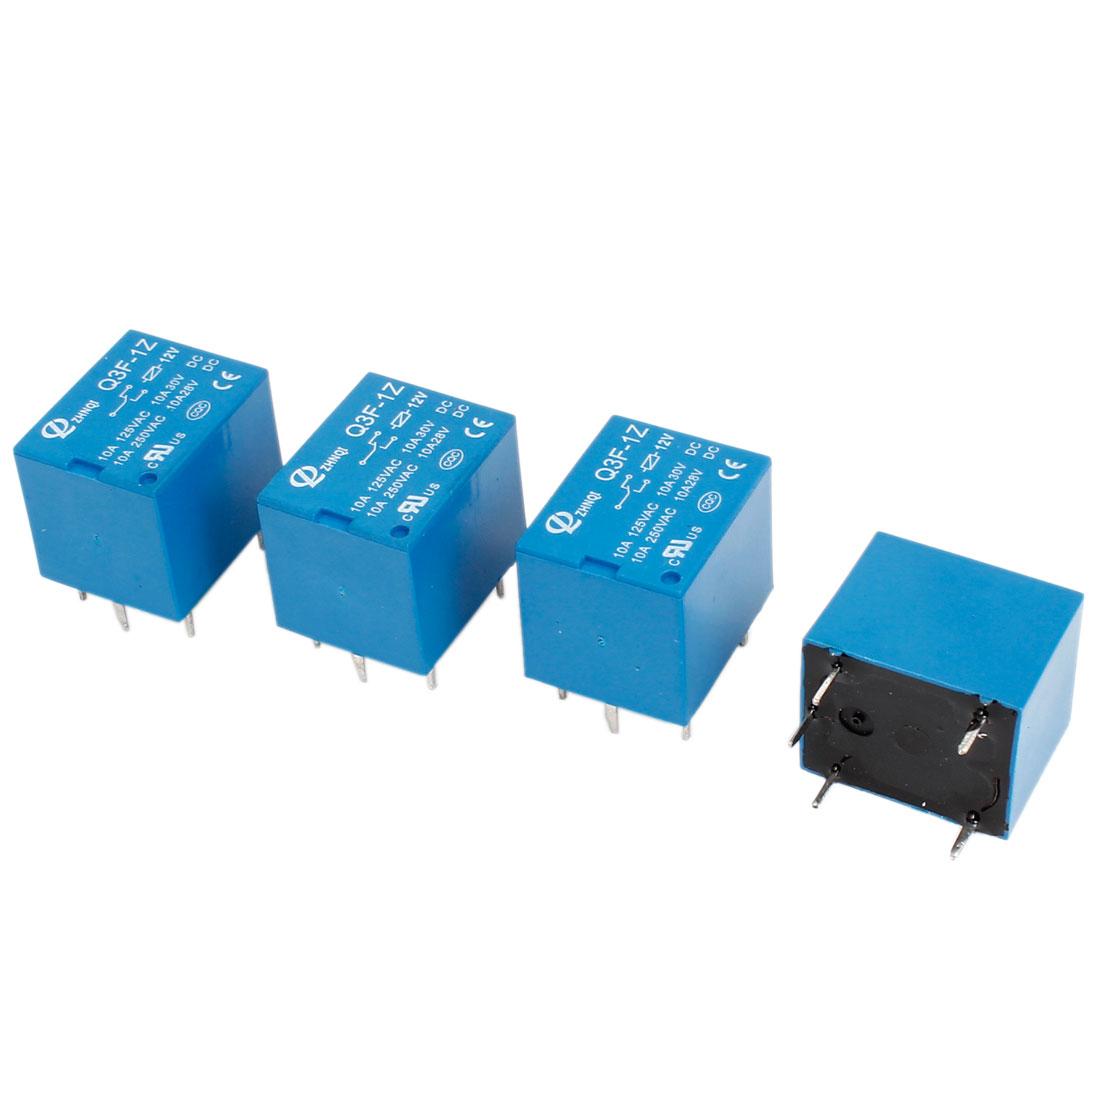 4PCS Q3F-1Z DC 12V 10A Coil Volt SPDT PCB General Purpose Power Relay